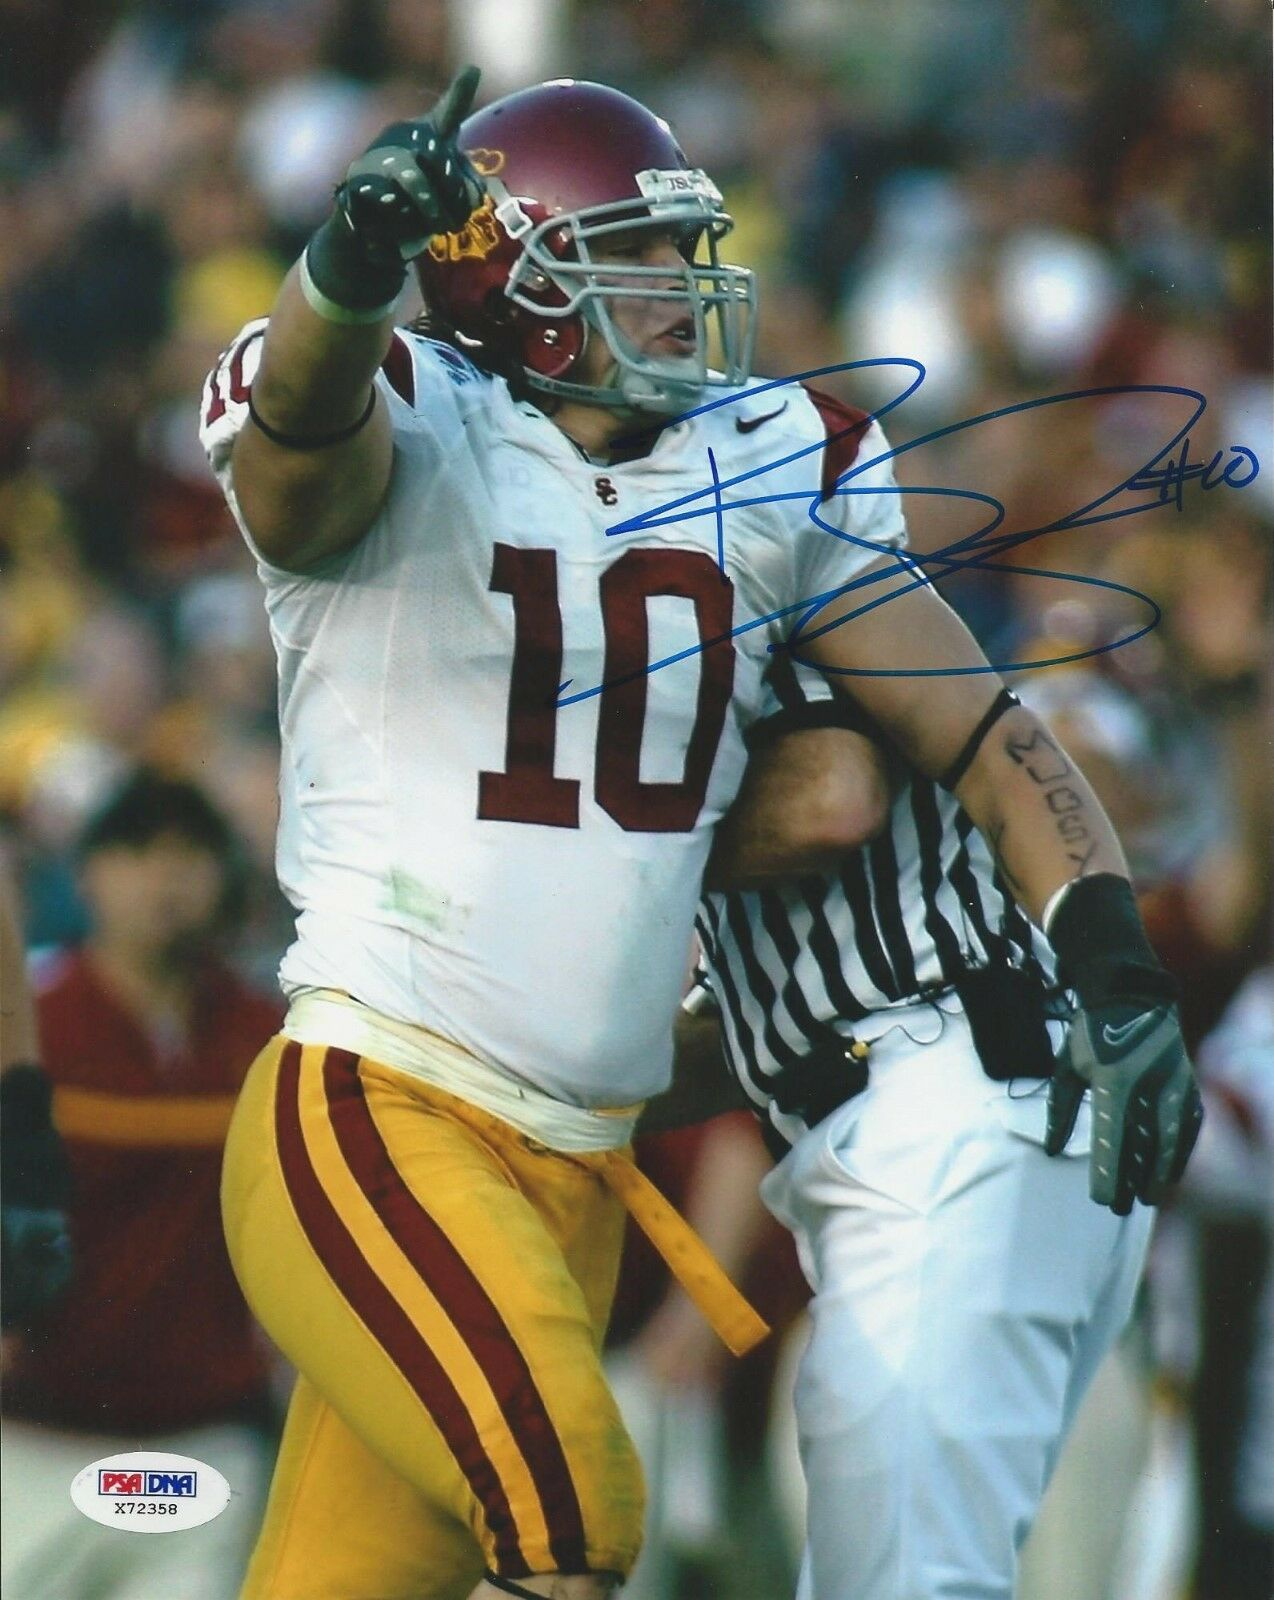 Brian Cushing USC Trojans signed 8x10 photo PSA/DNA #X72358